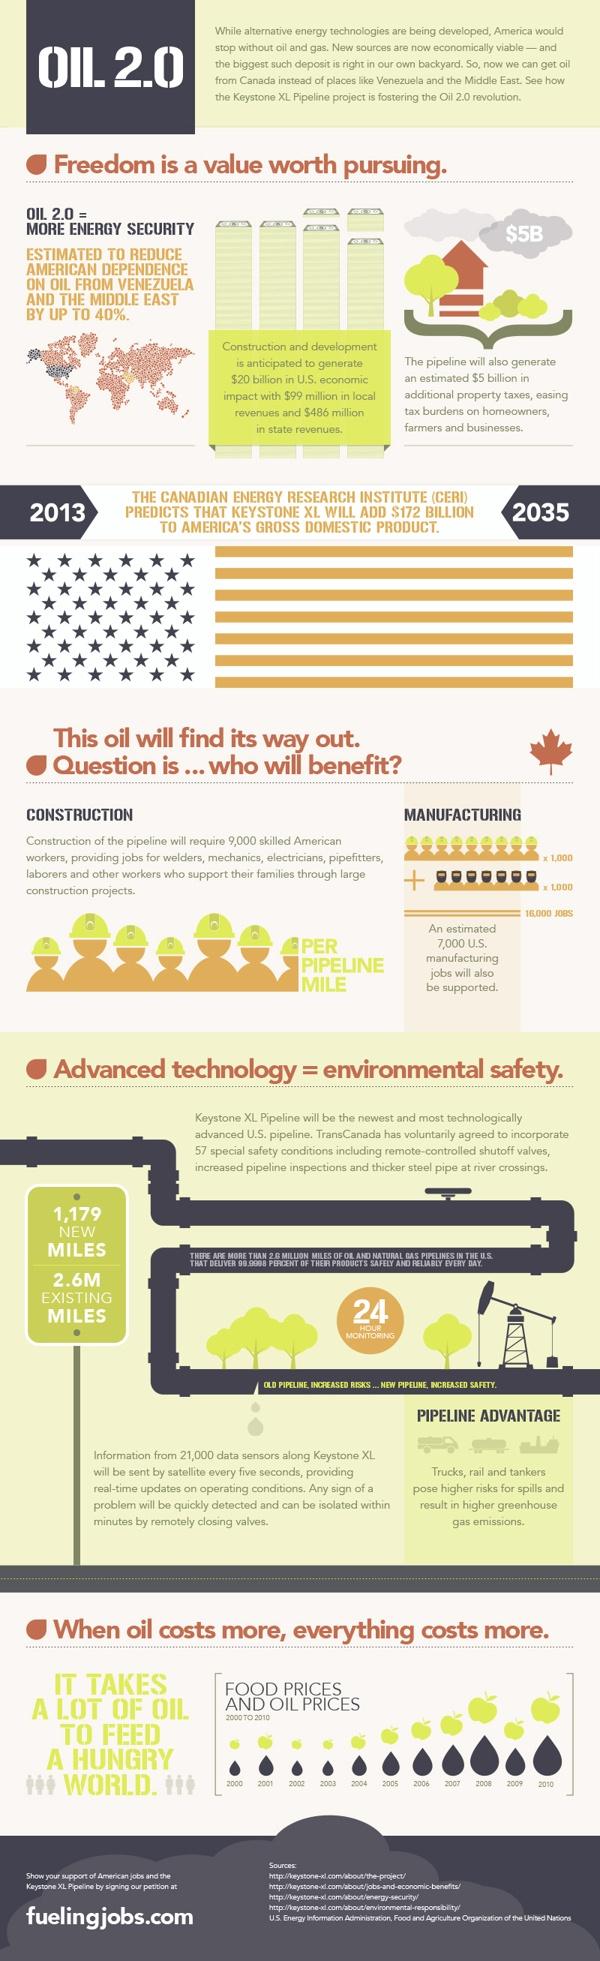 D E A F E Dfa D B Free Gas Peak Oil on Keystone Xl Pipeline Infographic